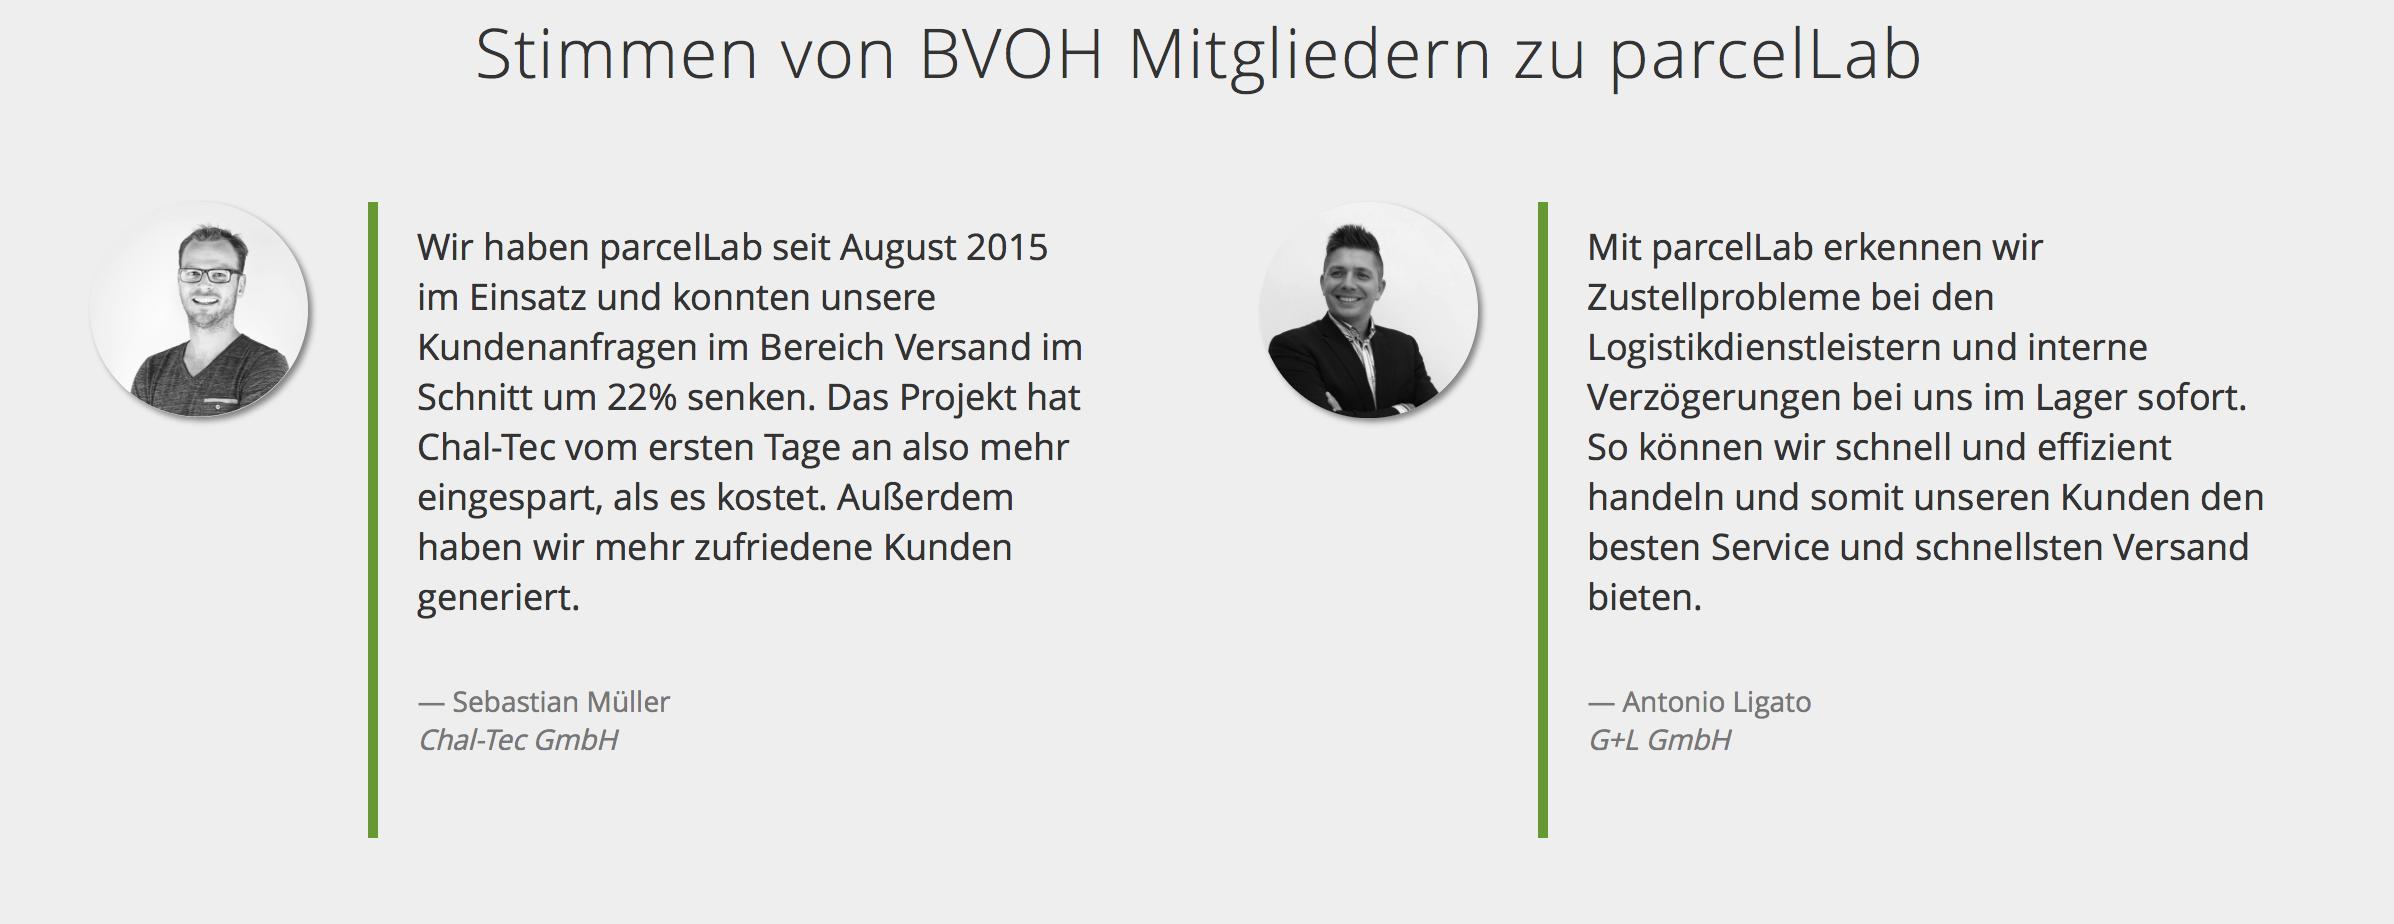 BVOH Paketstudie parcellab